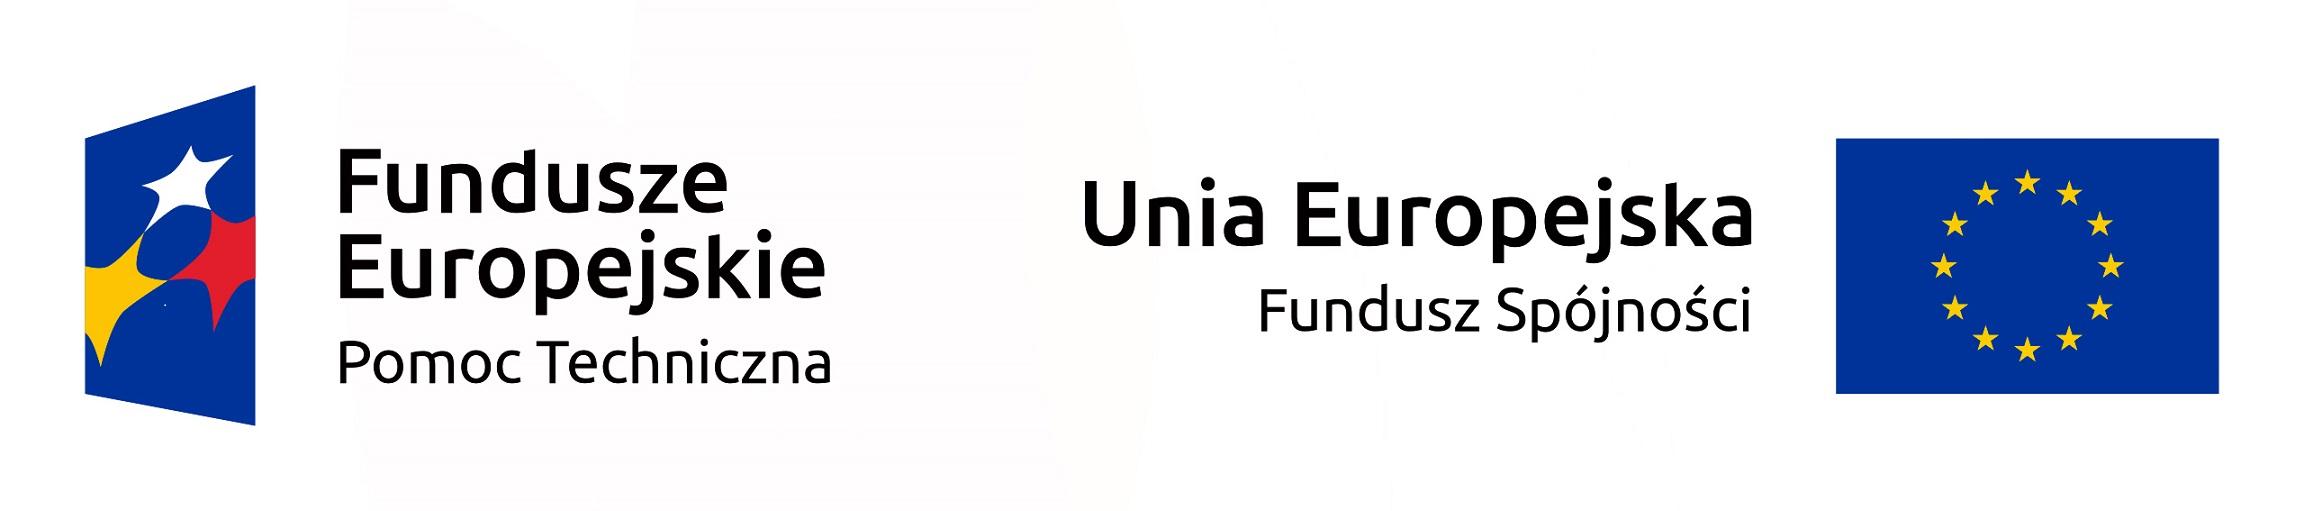 logo [2304x511]